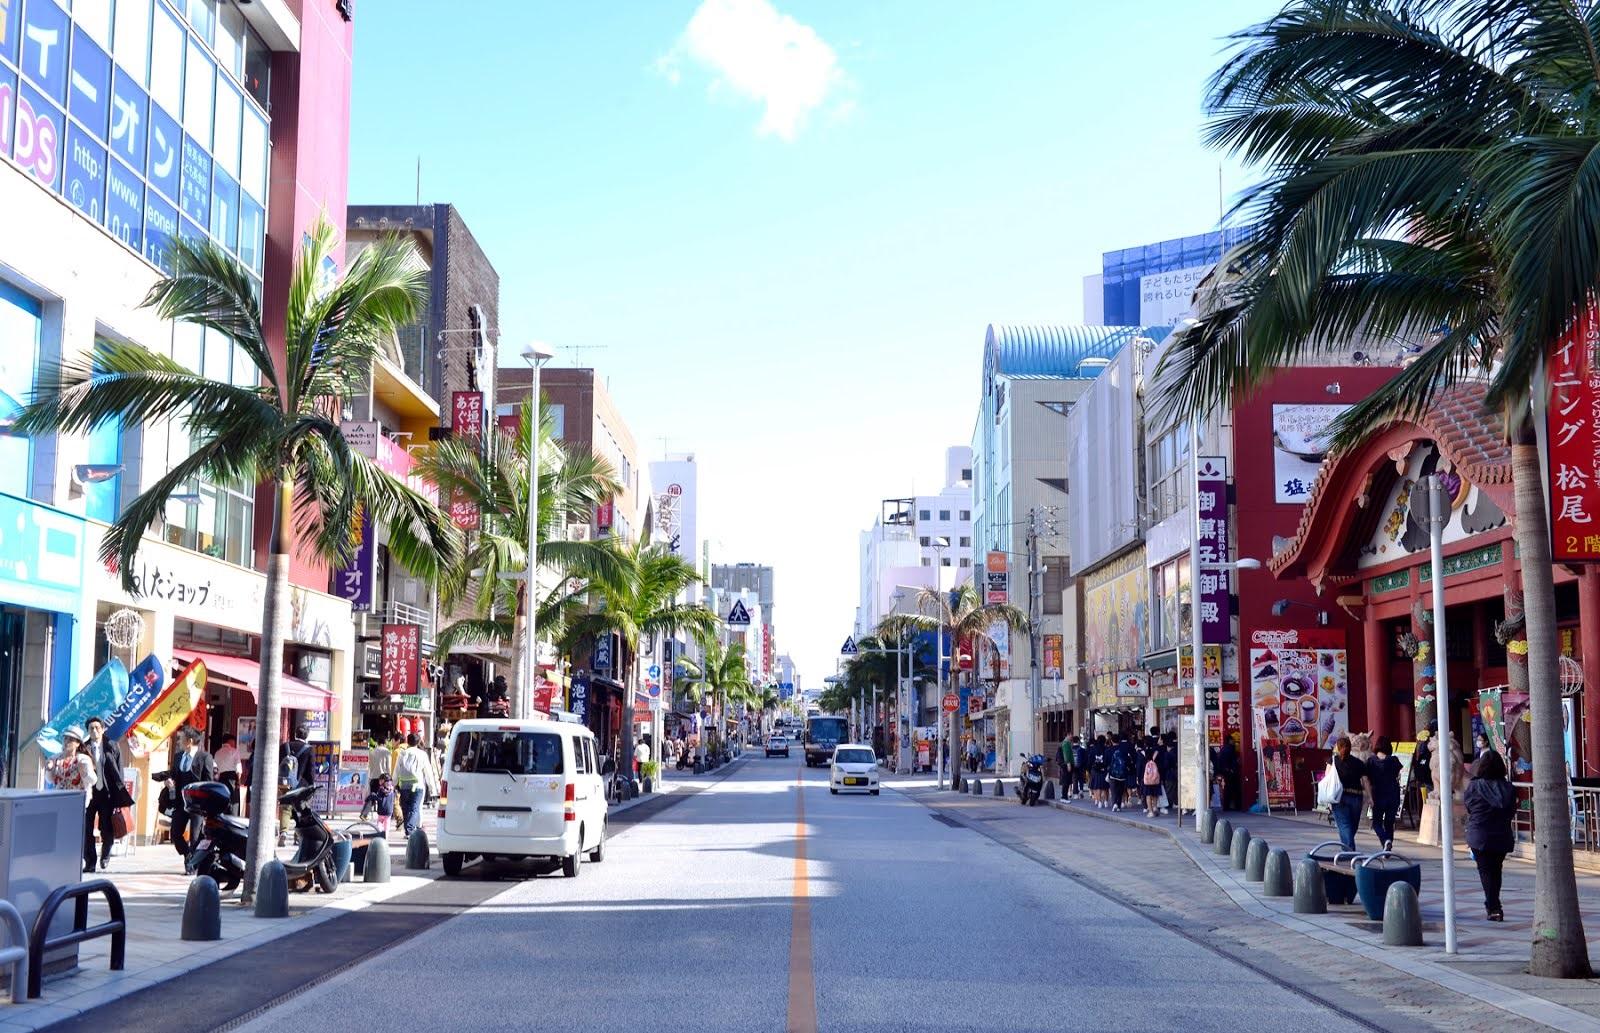 Khu phố mua sắm Kokusaidori